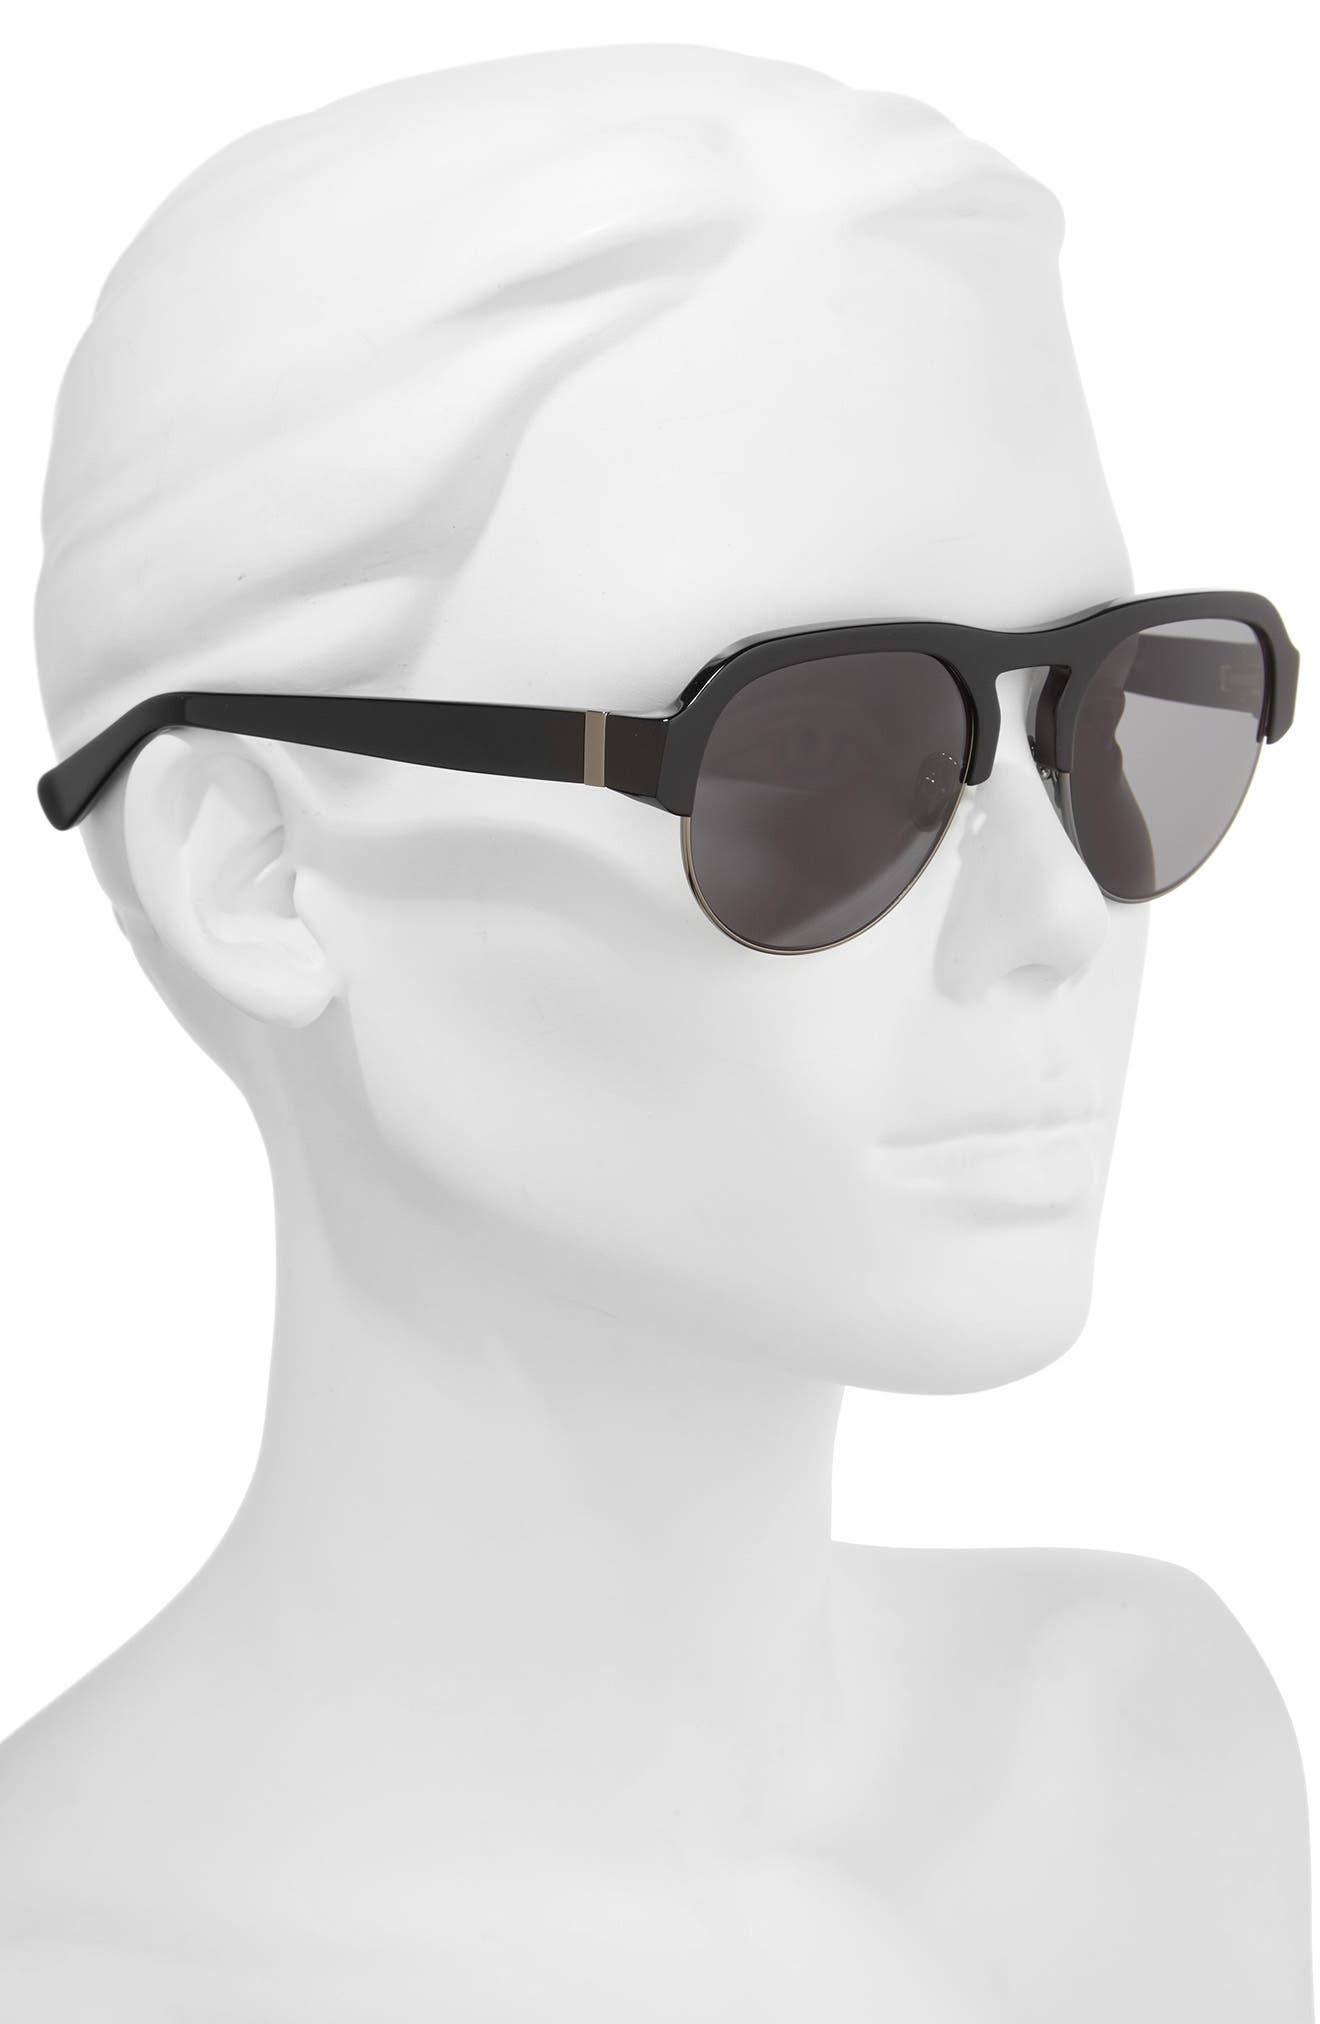 Nomad 52mm Sunglasses,                             Alternate thumbnail 2, color,                             Black/ Gunmetal